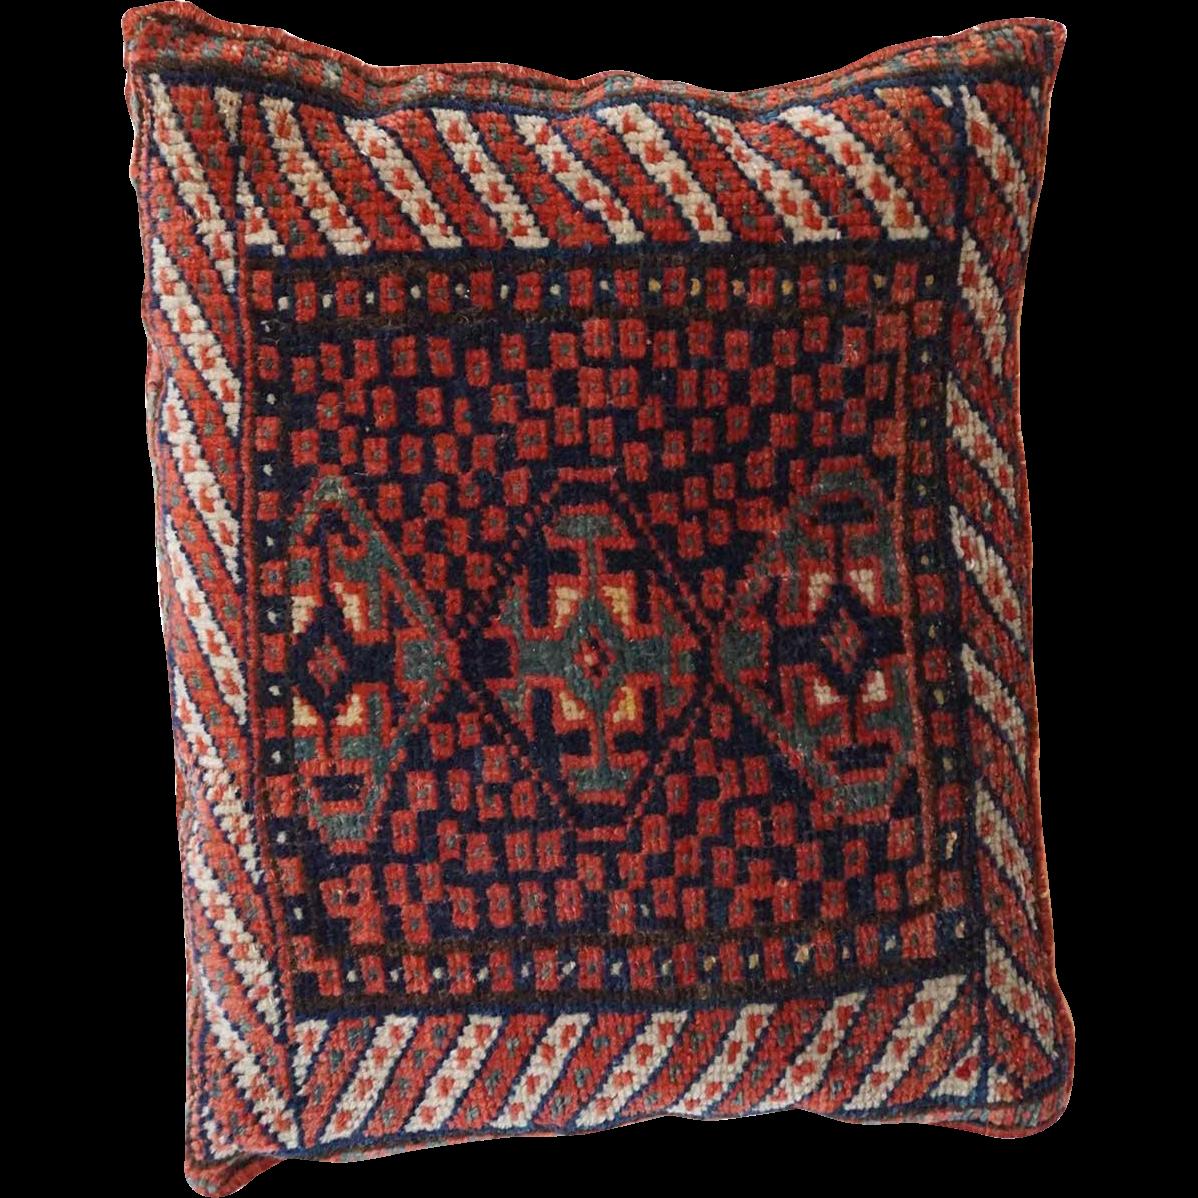 Vintage Red Bag Face Pillow